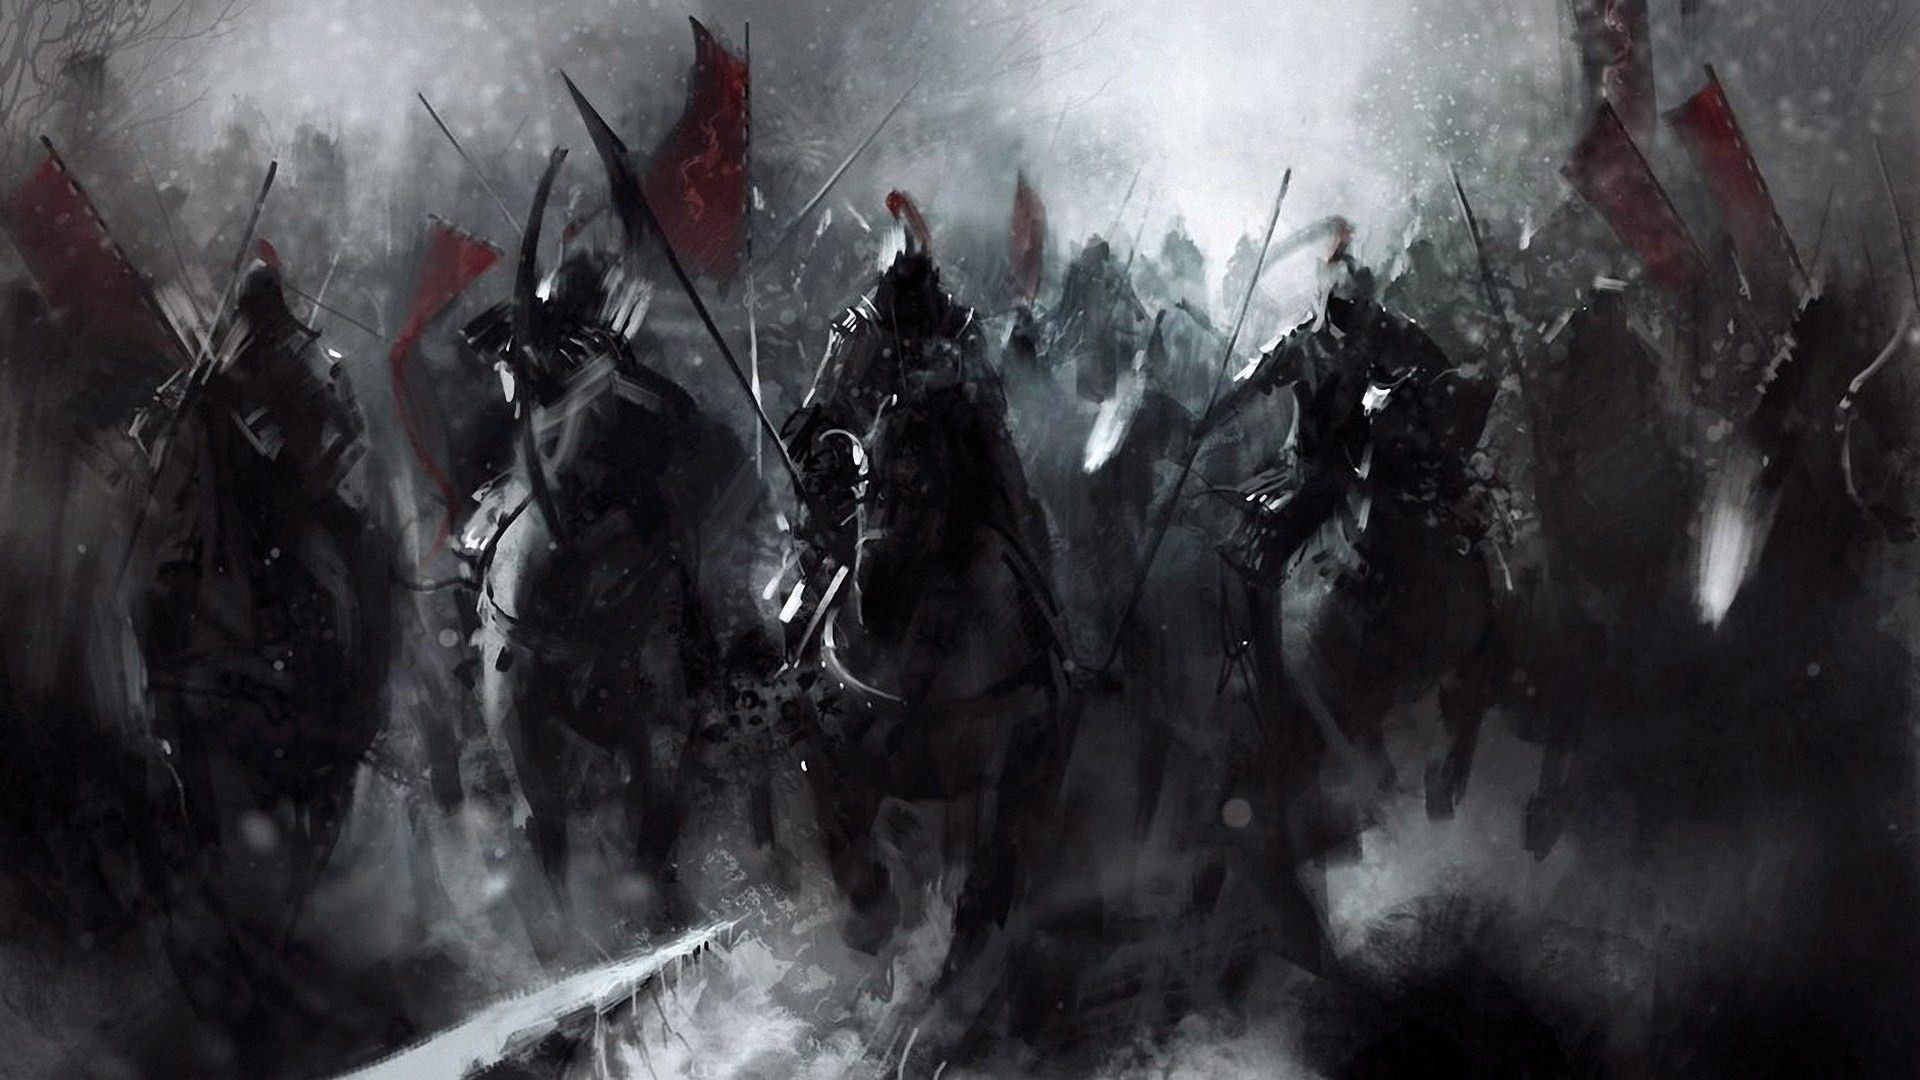 Army Bow Cavalry Battle Medieval Fantasy Art Warrior War Artwork Wallpaper Fantasy Concept Art Dark Fantasy Fantasy Artwork